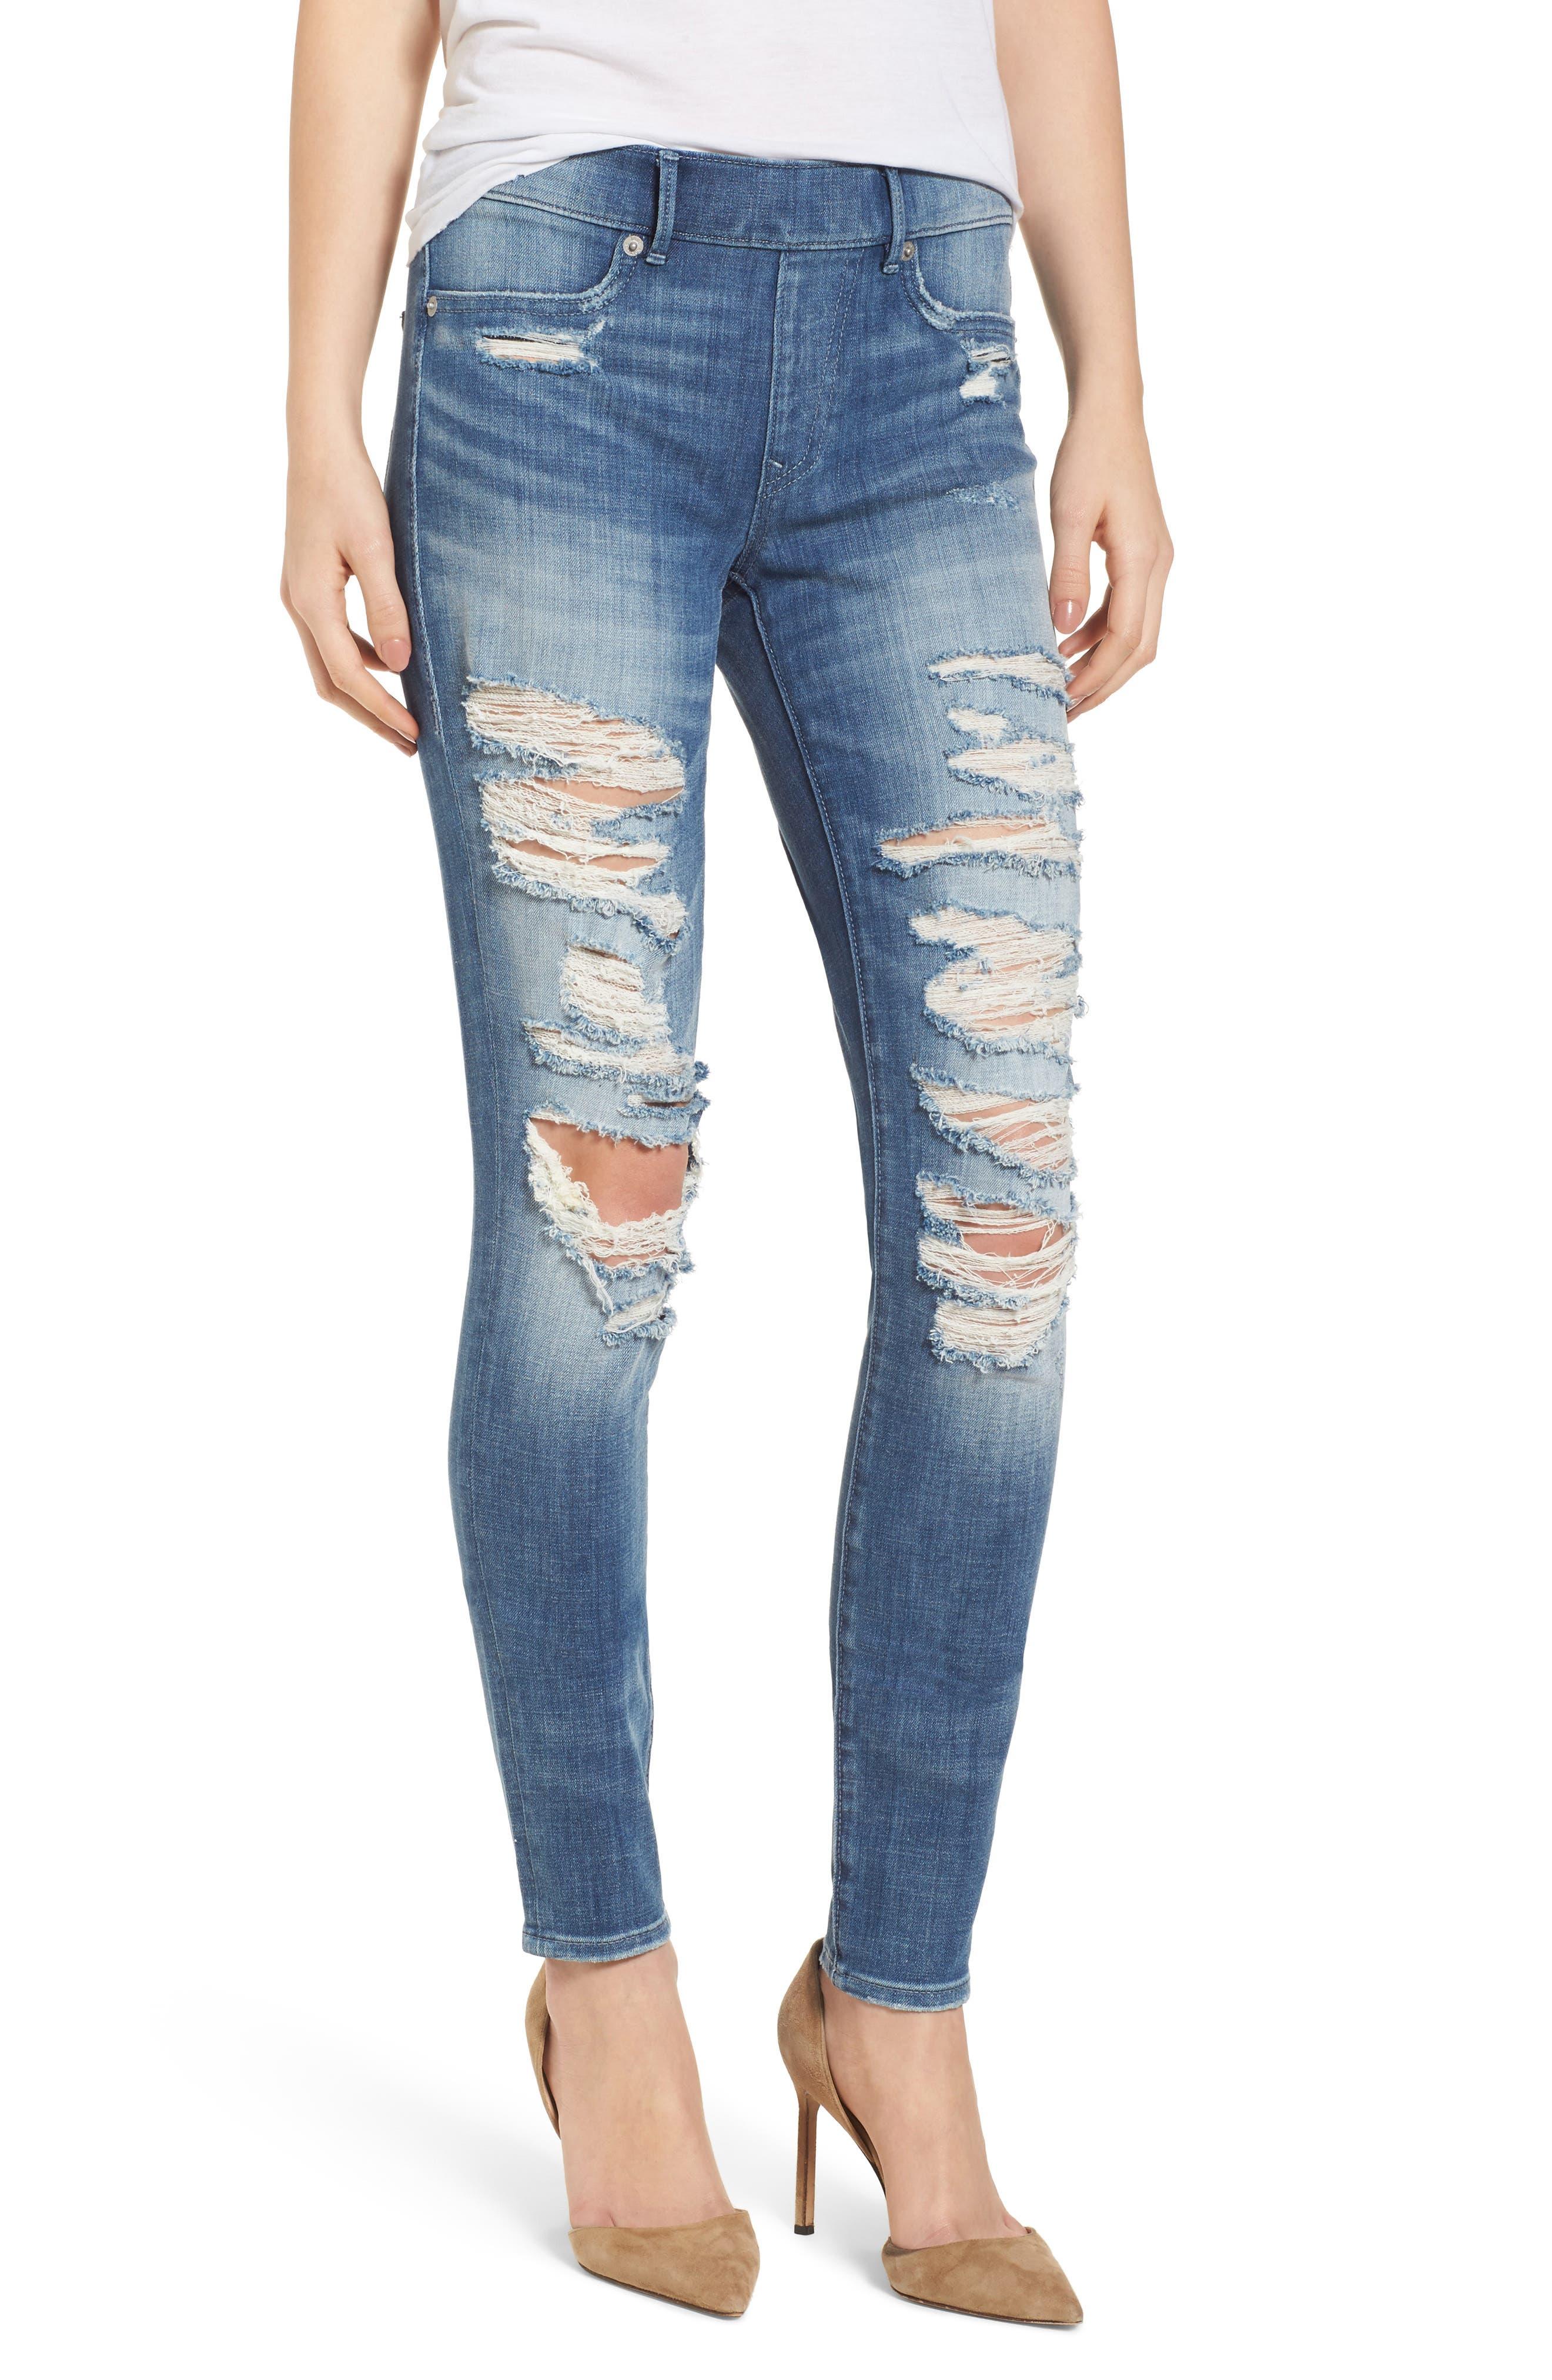 Jennie Runaway Legging Jeans,                             Main thumbnail 1, color,                             401